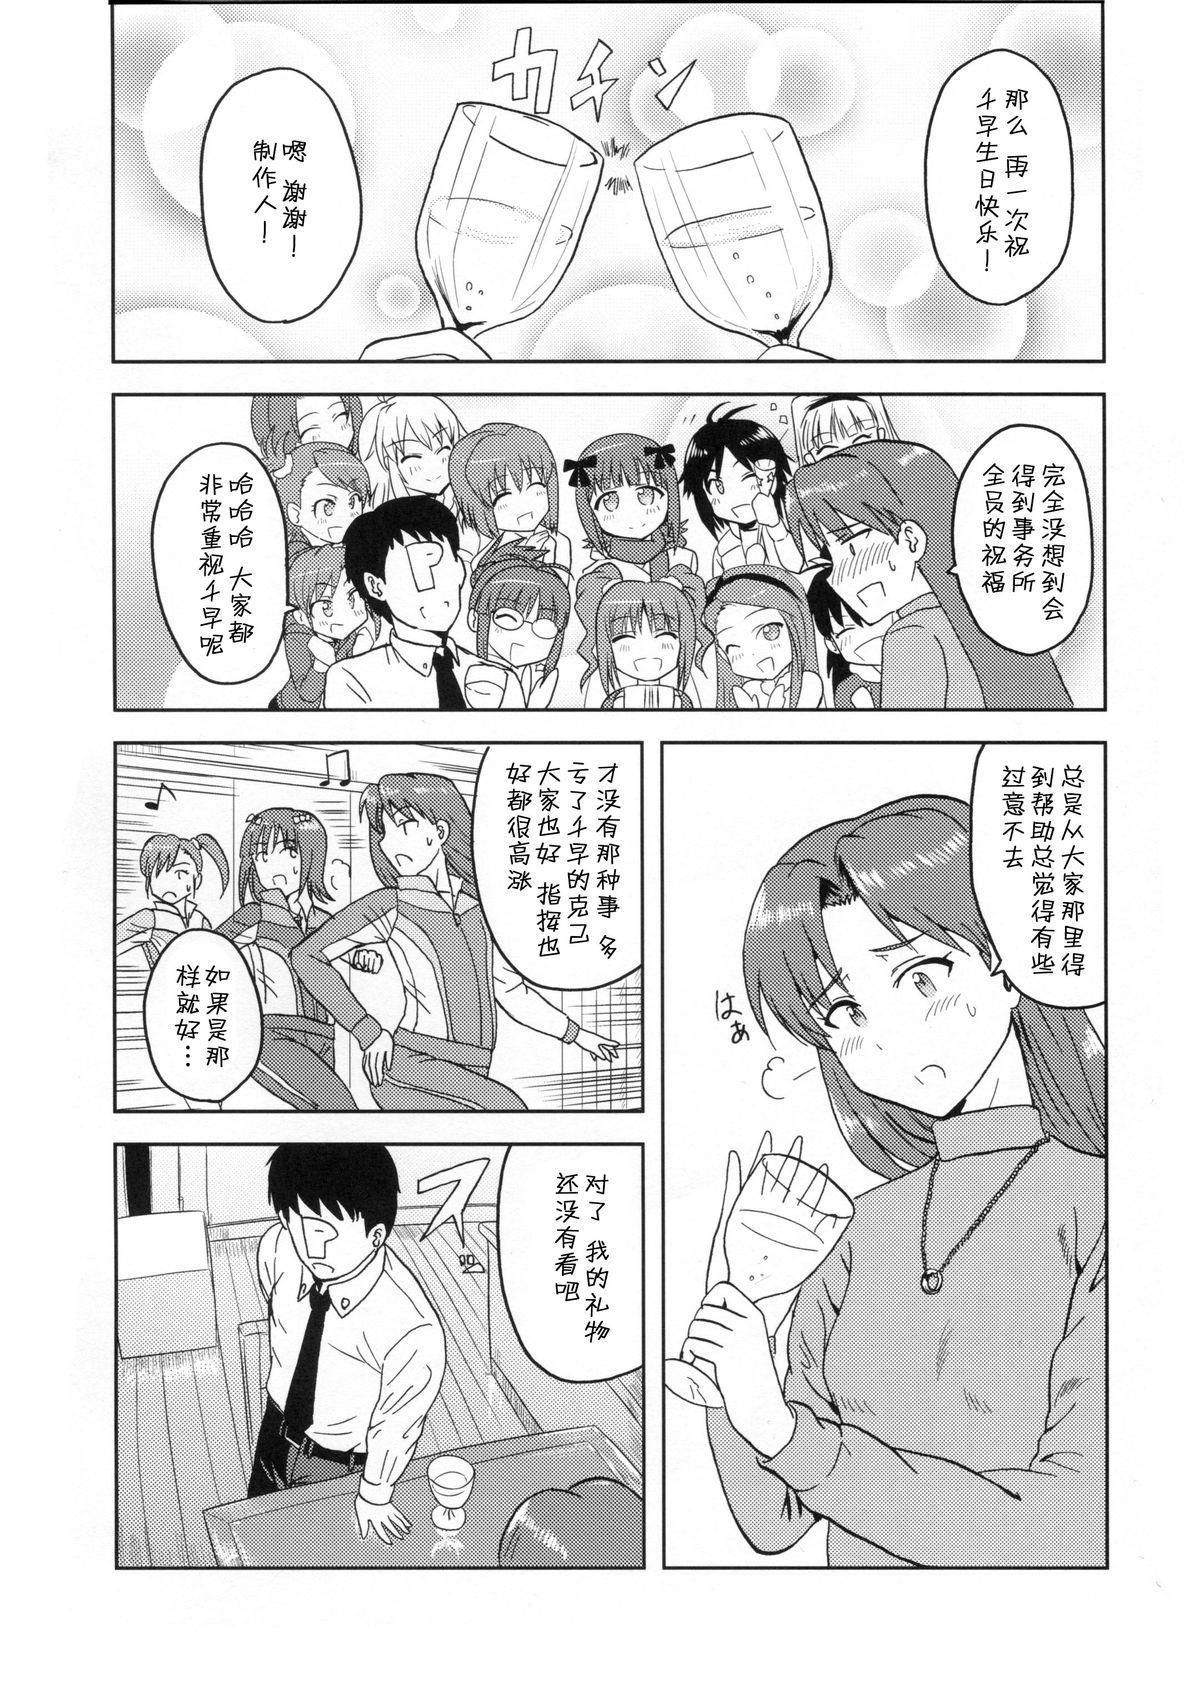 Kisaragi Chihaya no Tanjou Kinenbi 3